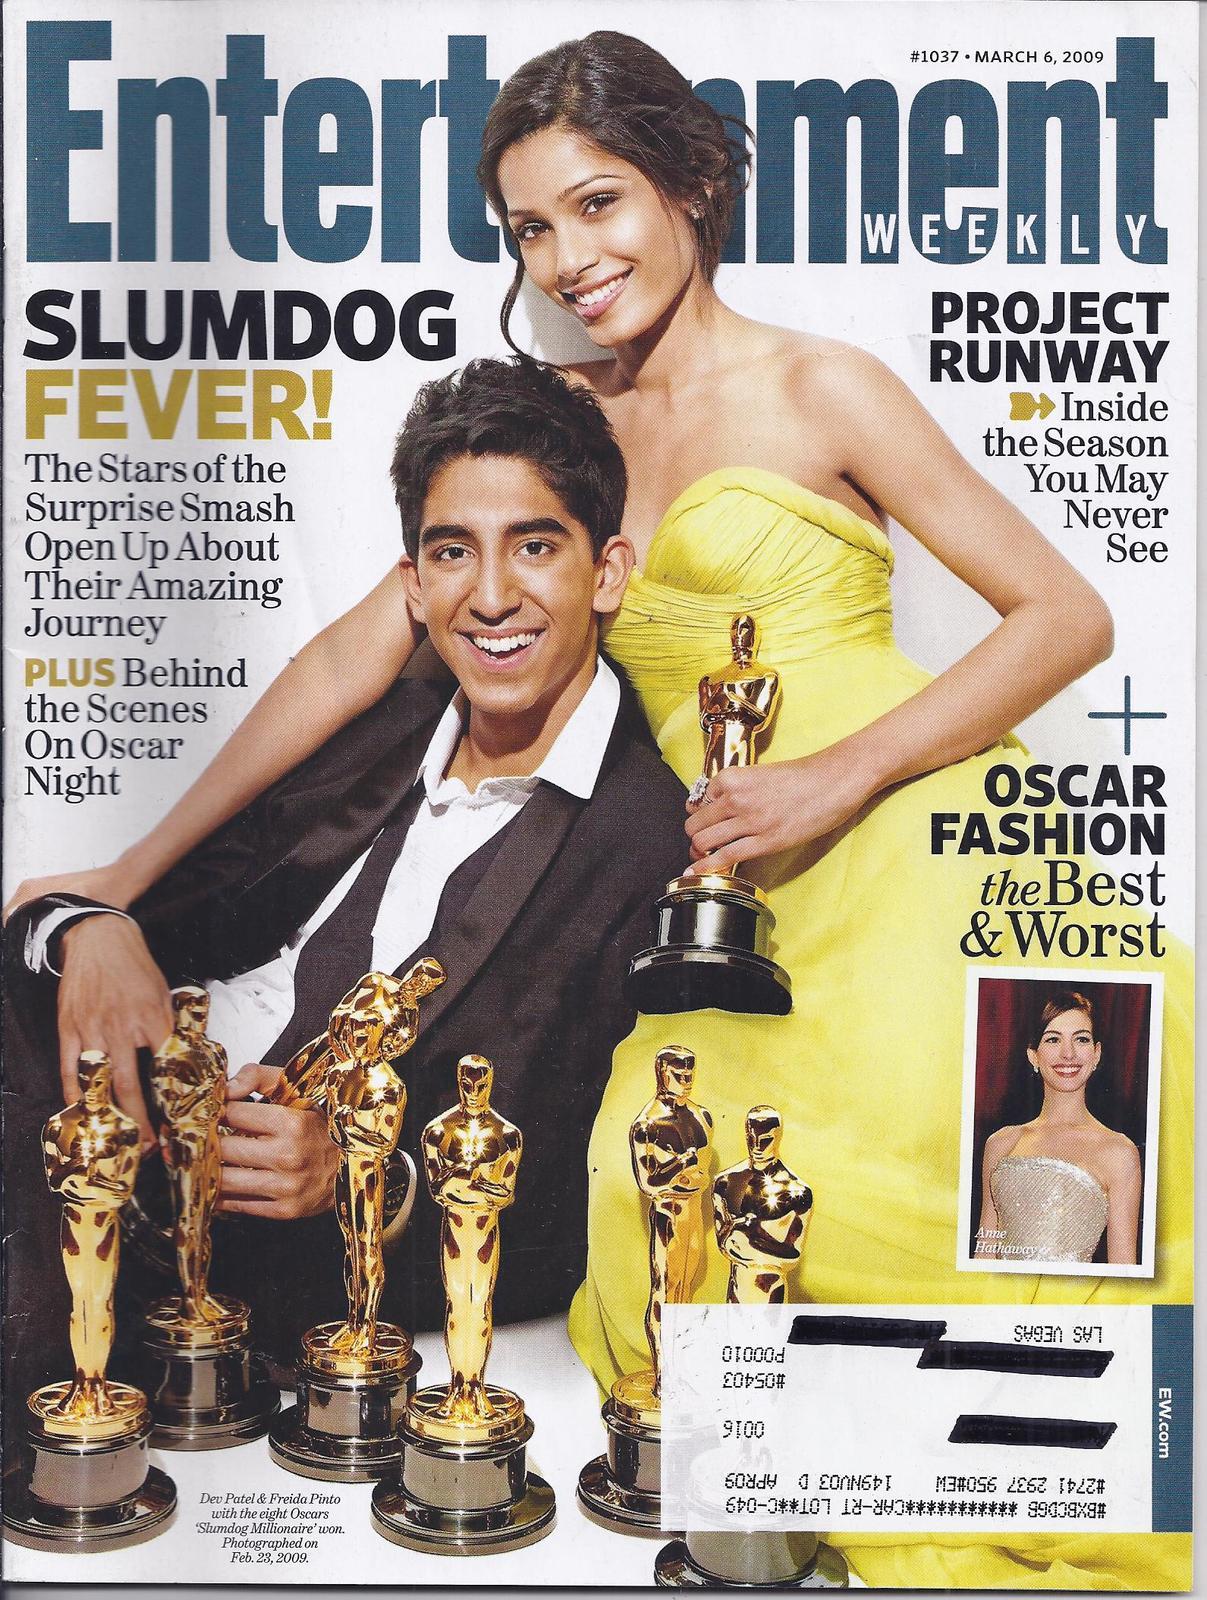 Entertainment slumdog fever